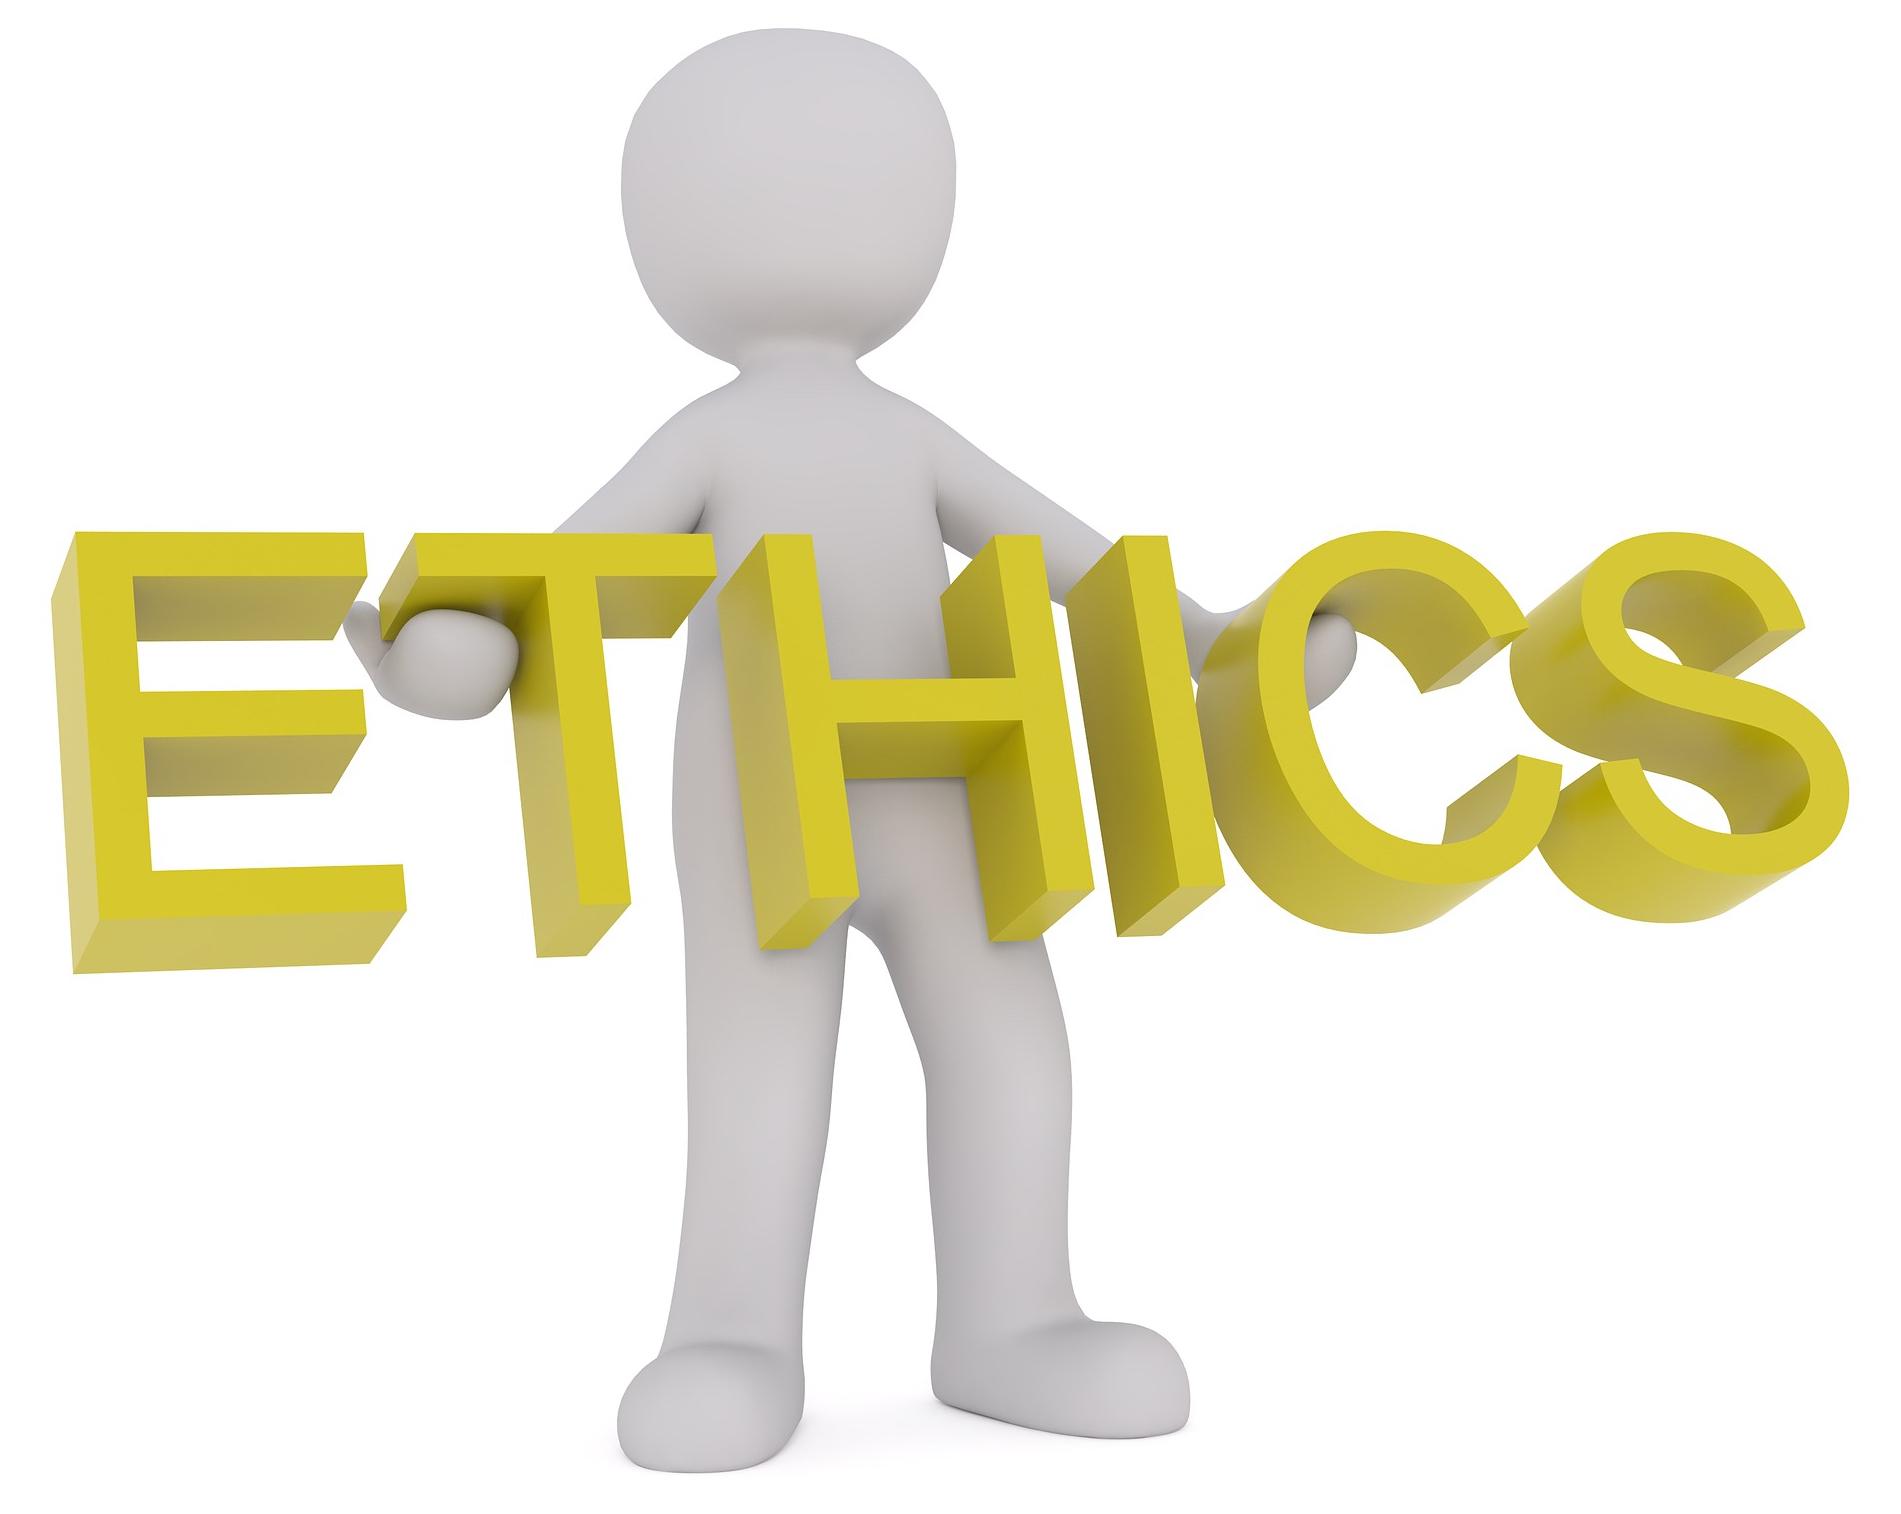 ethics-2110583_1920_3dman_eu